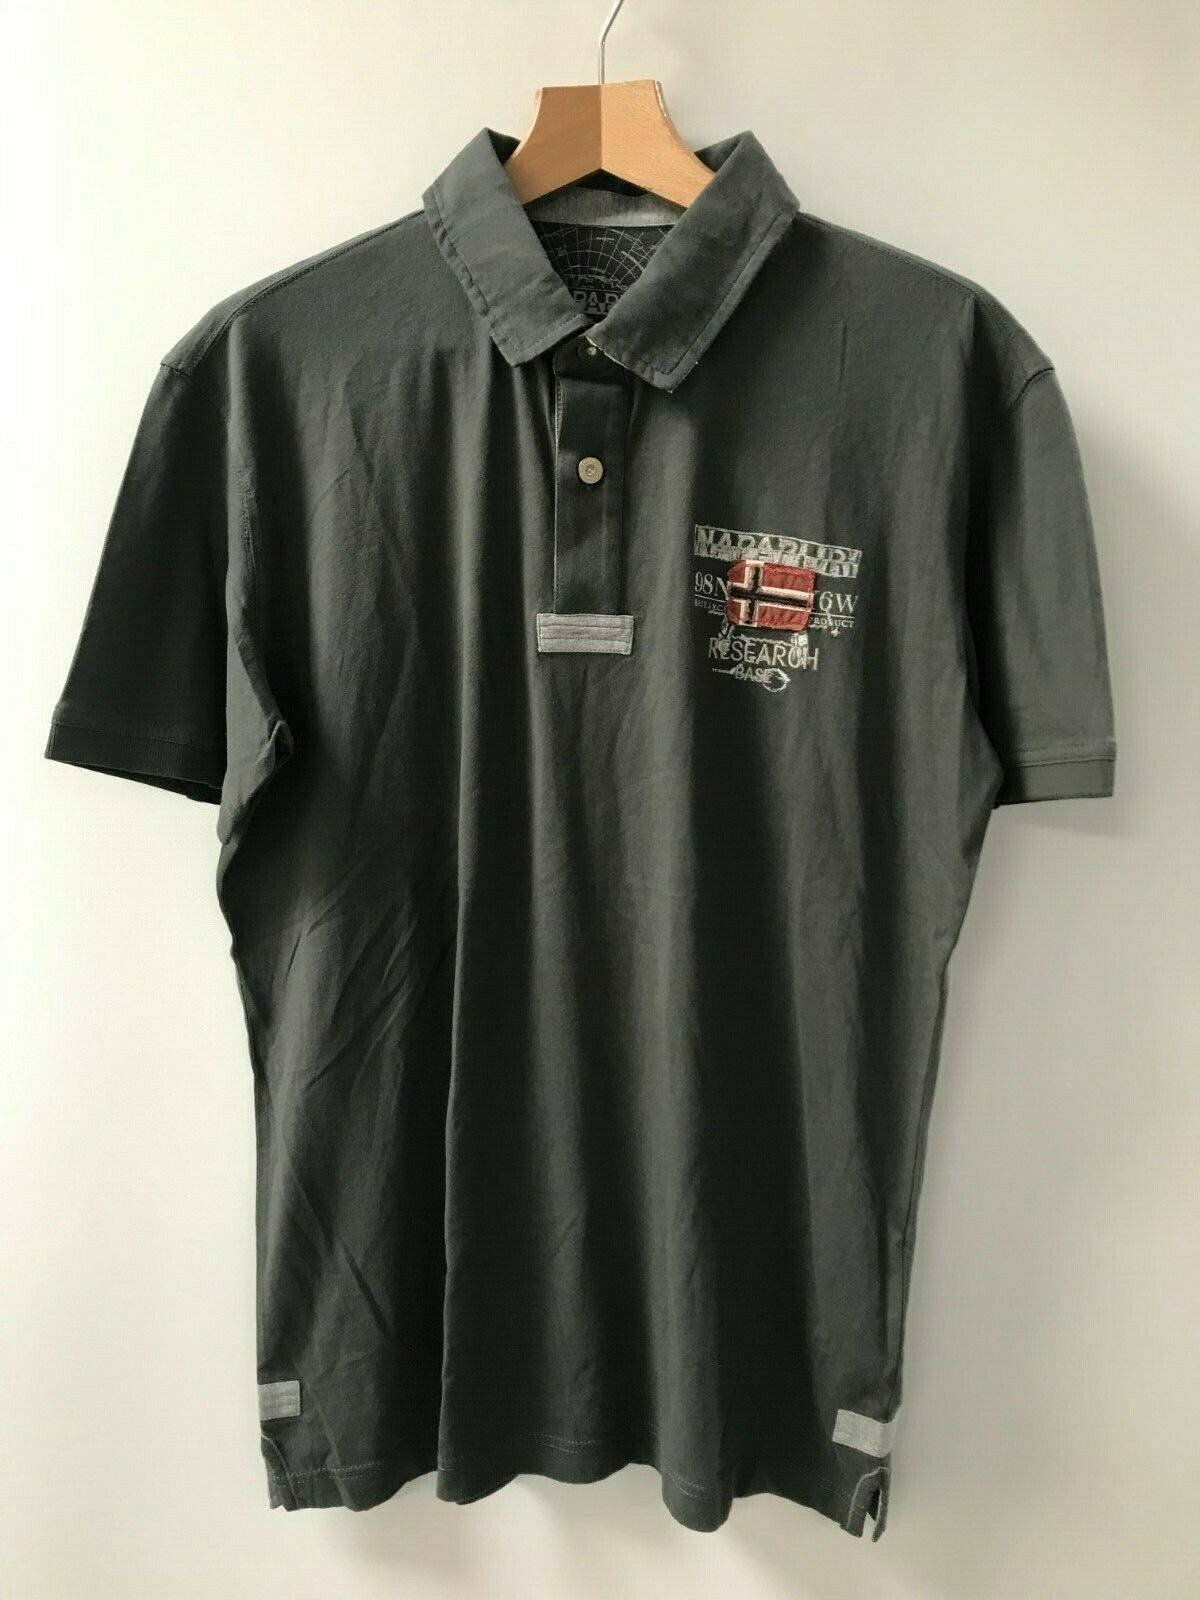 NAPAPIJRI ® - Esta Serre-Polo Shirt-Taille XL-neuf-prix conseillé = 90 £